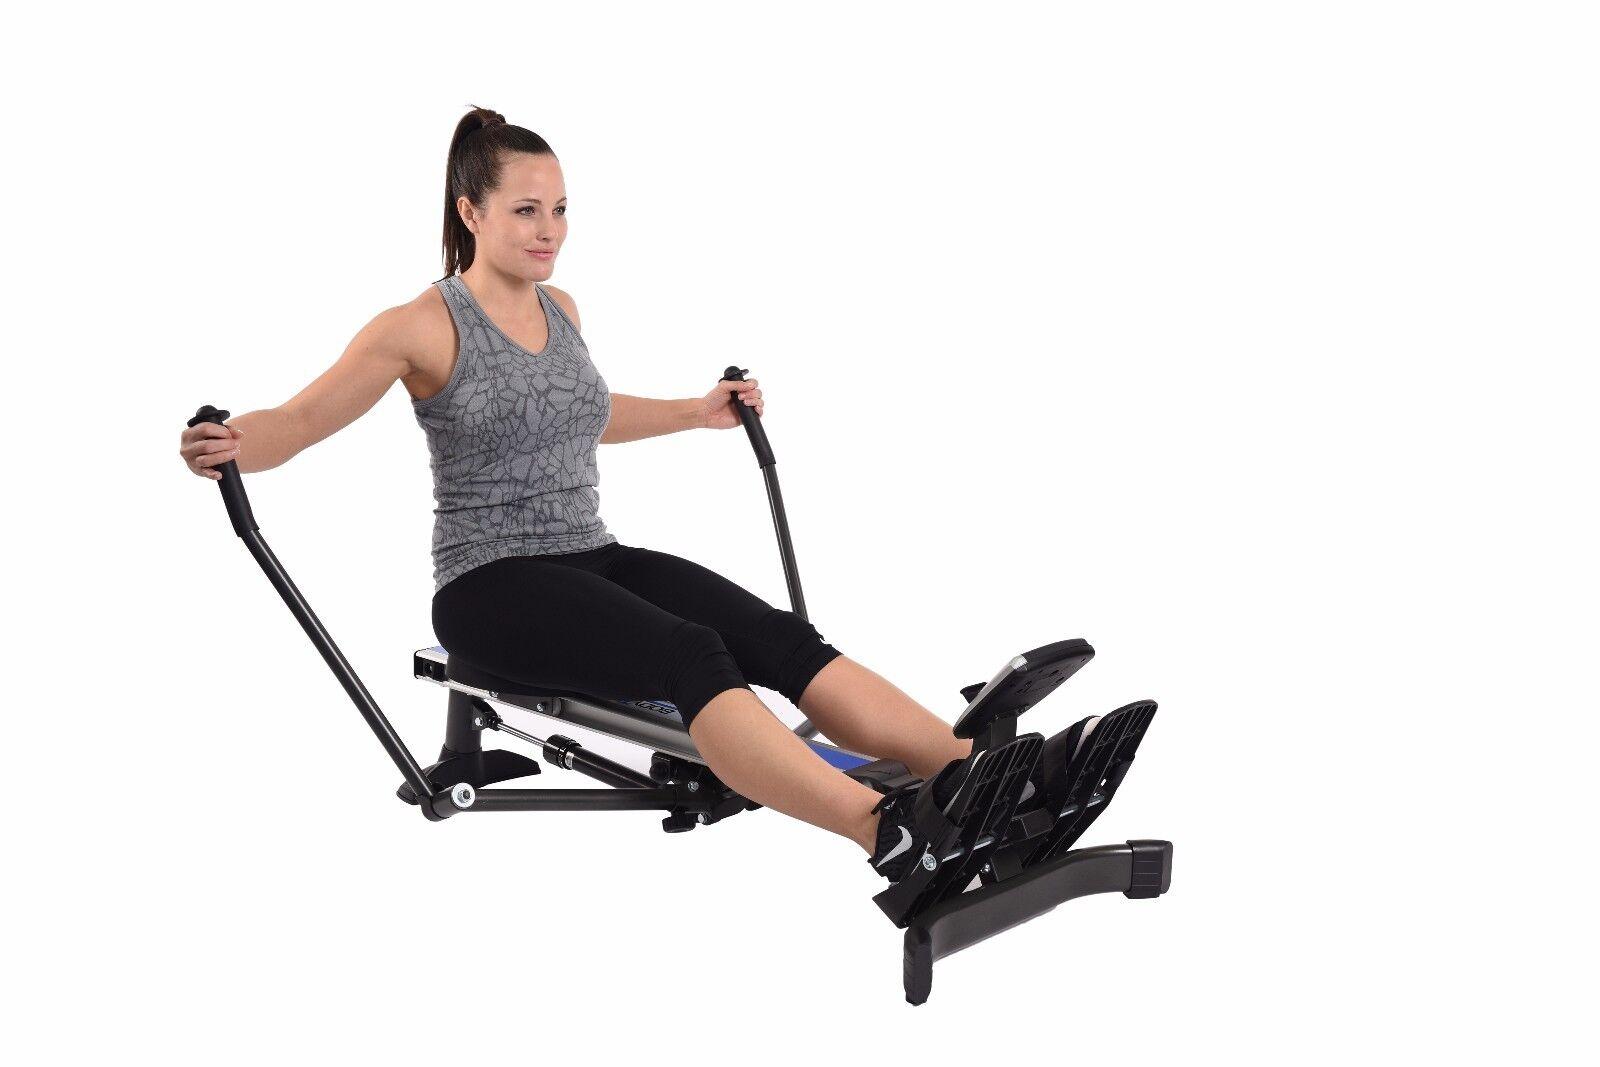 STAMINA BodyTrac® Glider ROWER EXERCISE ROWING MACHINE 35-1